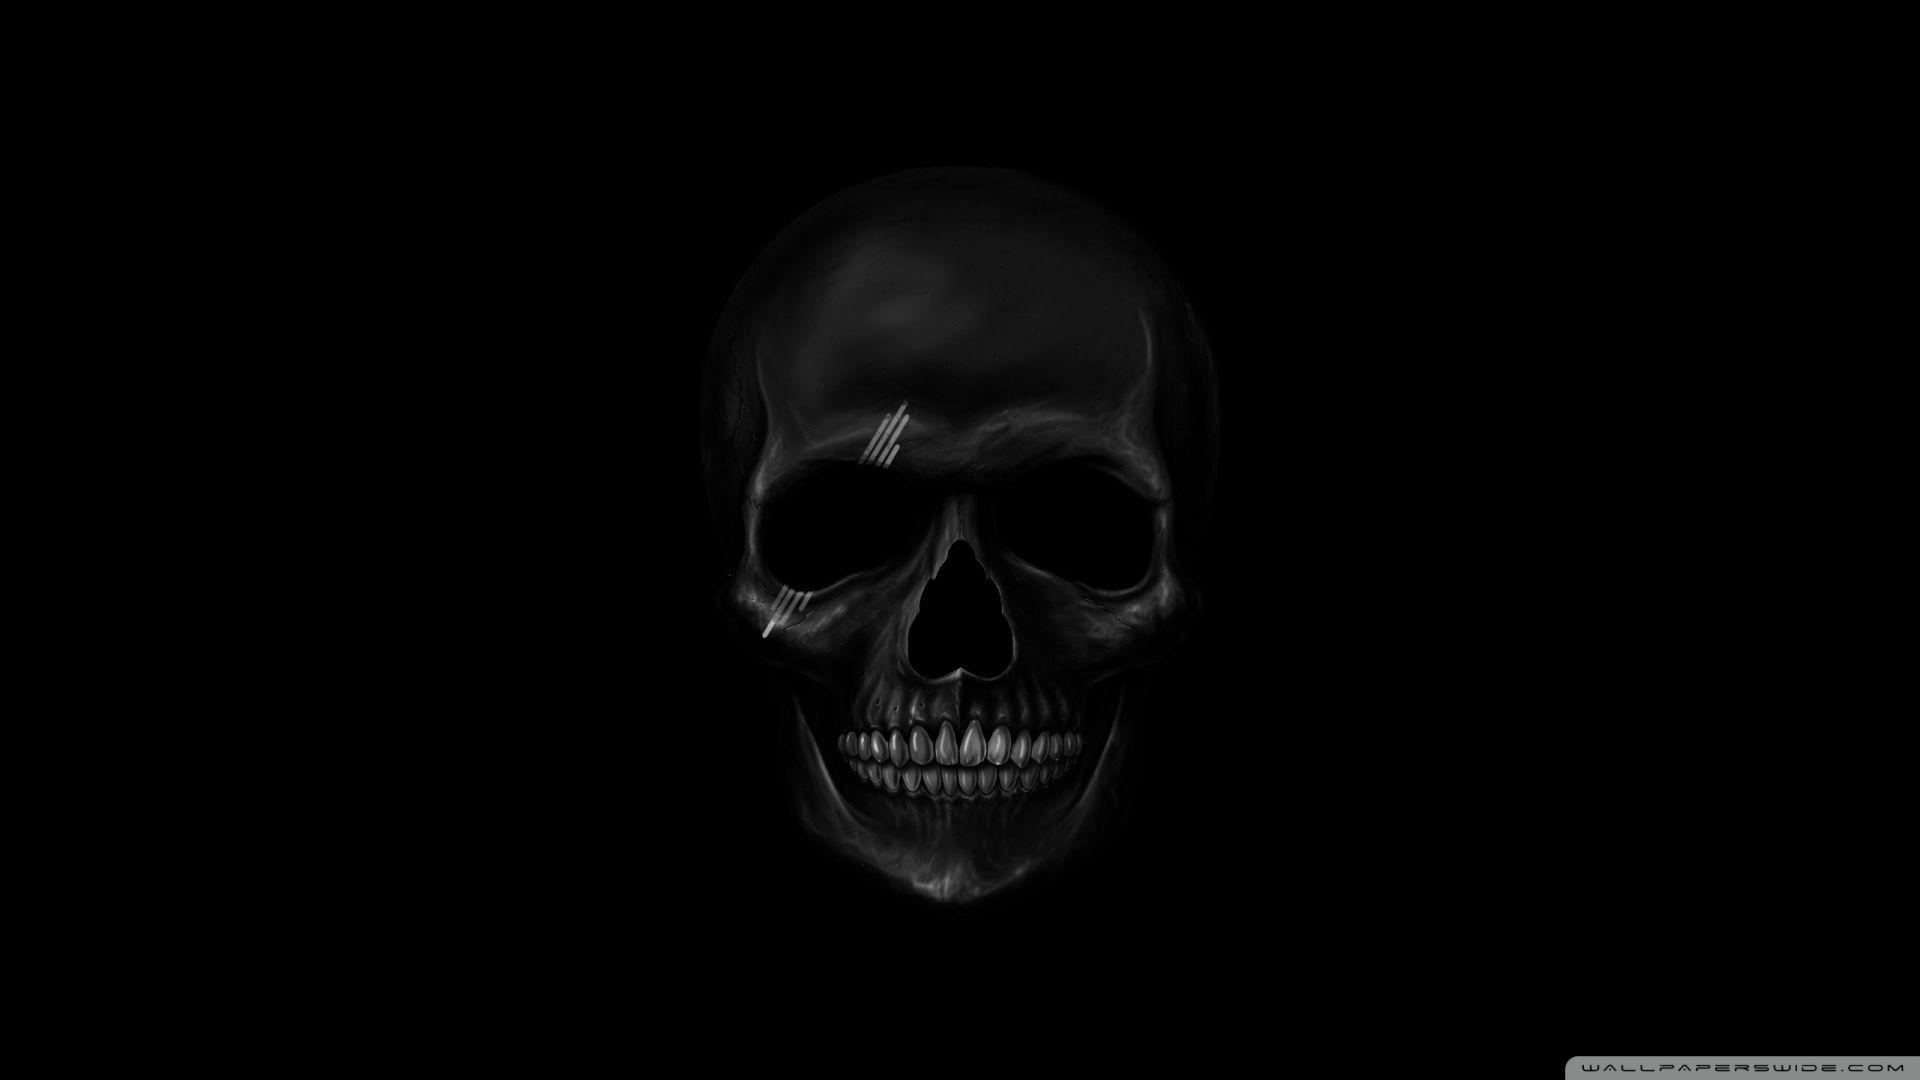 Dark Skull Wallpapers Top Free Dark Skull Backgrounds Wallpaperaccess